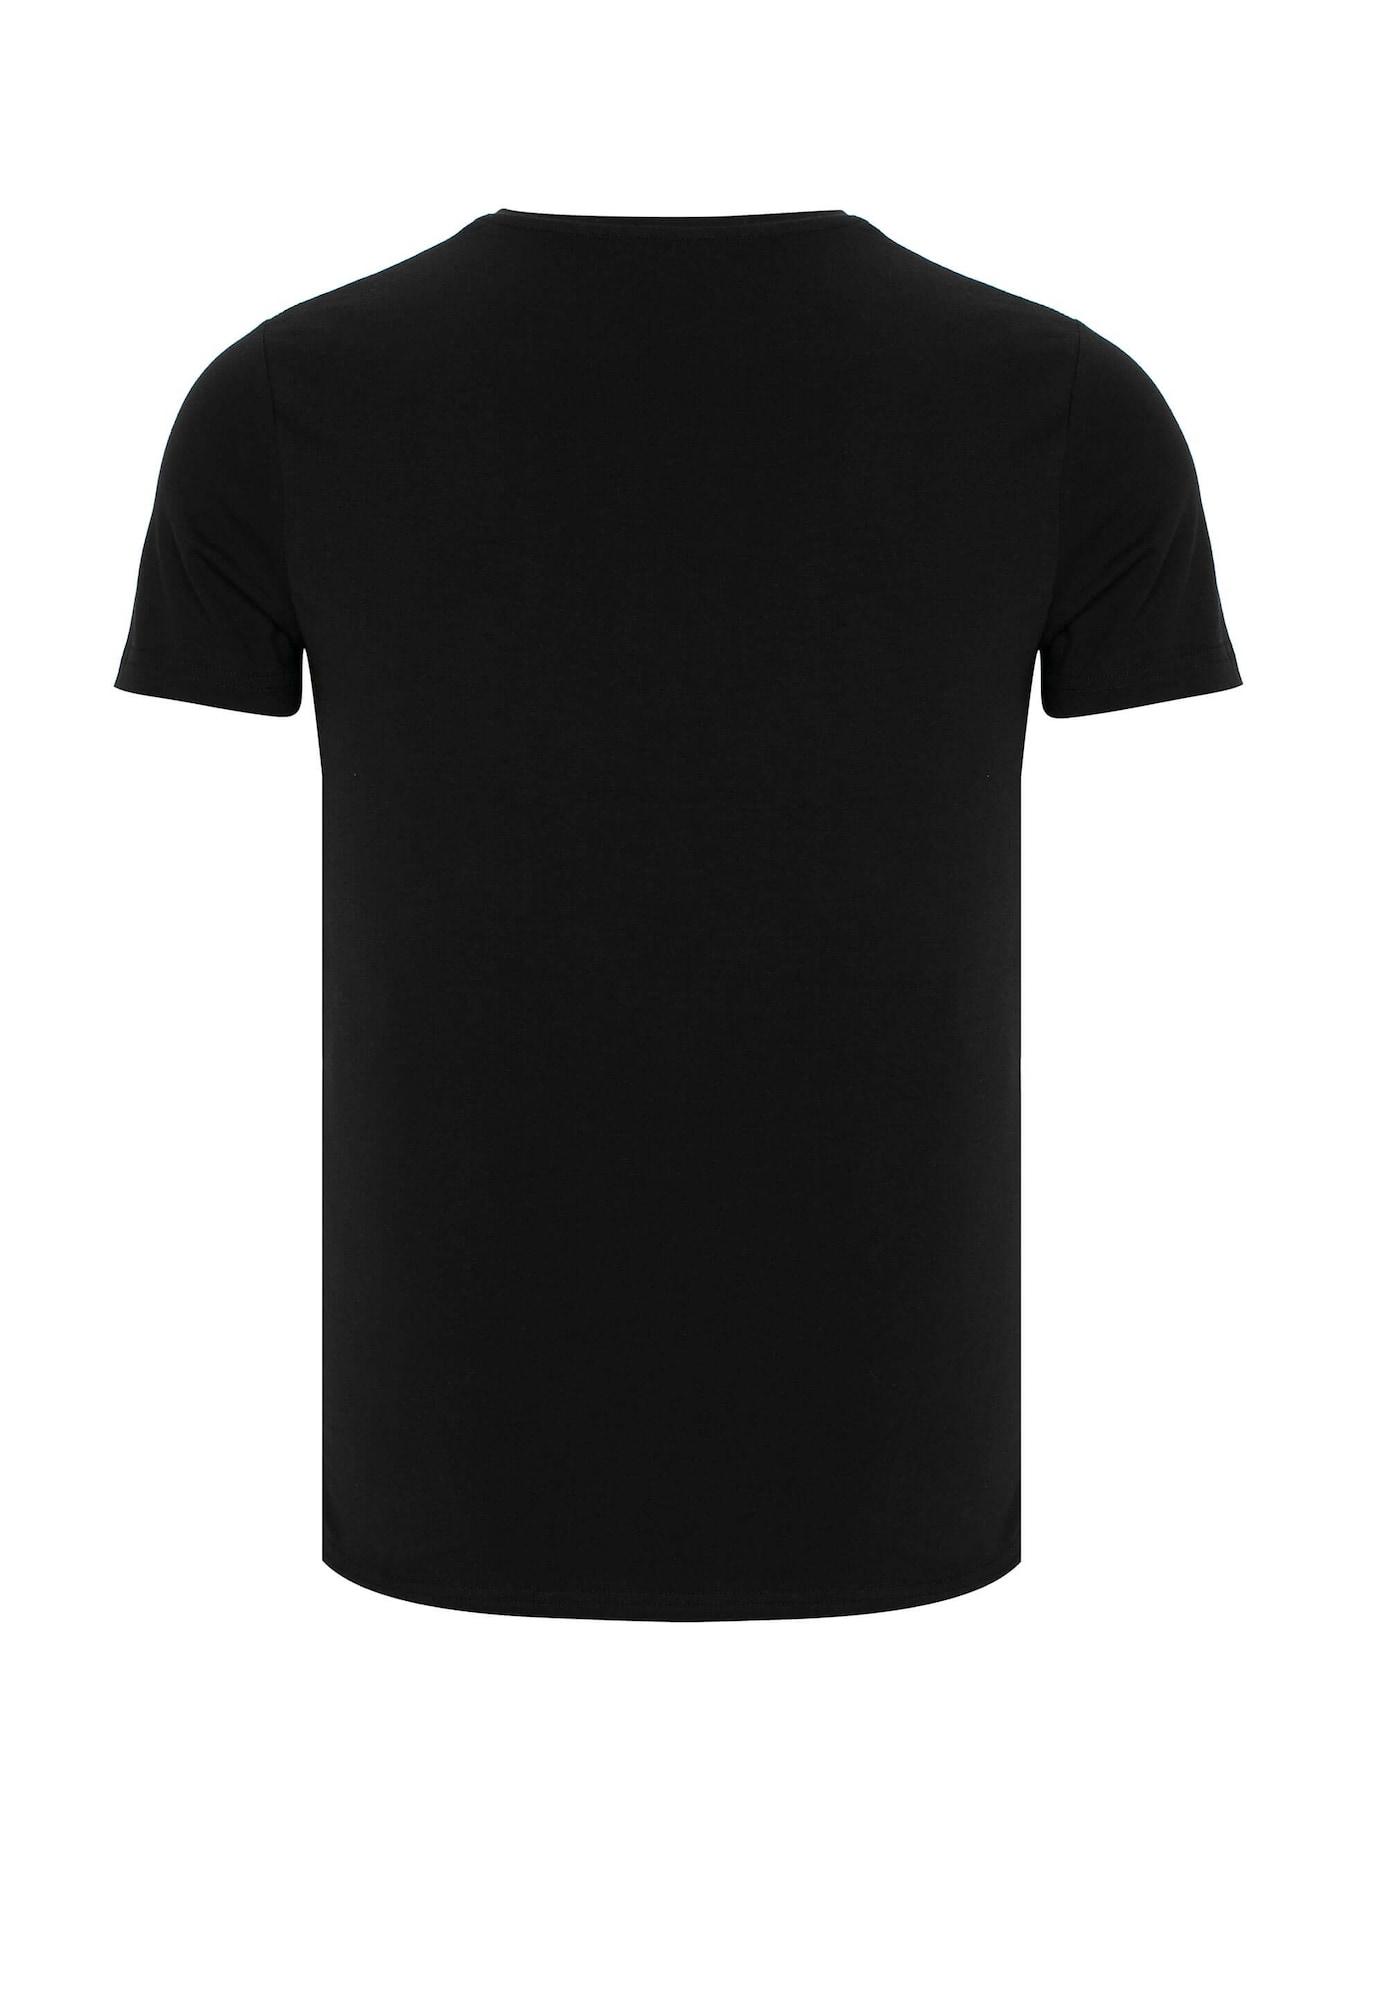 Shirt 'Chaos' CIPO & BAXX